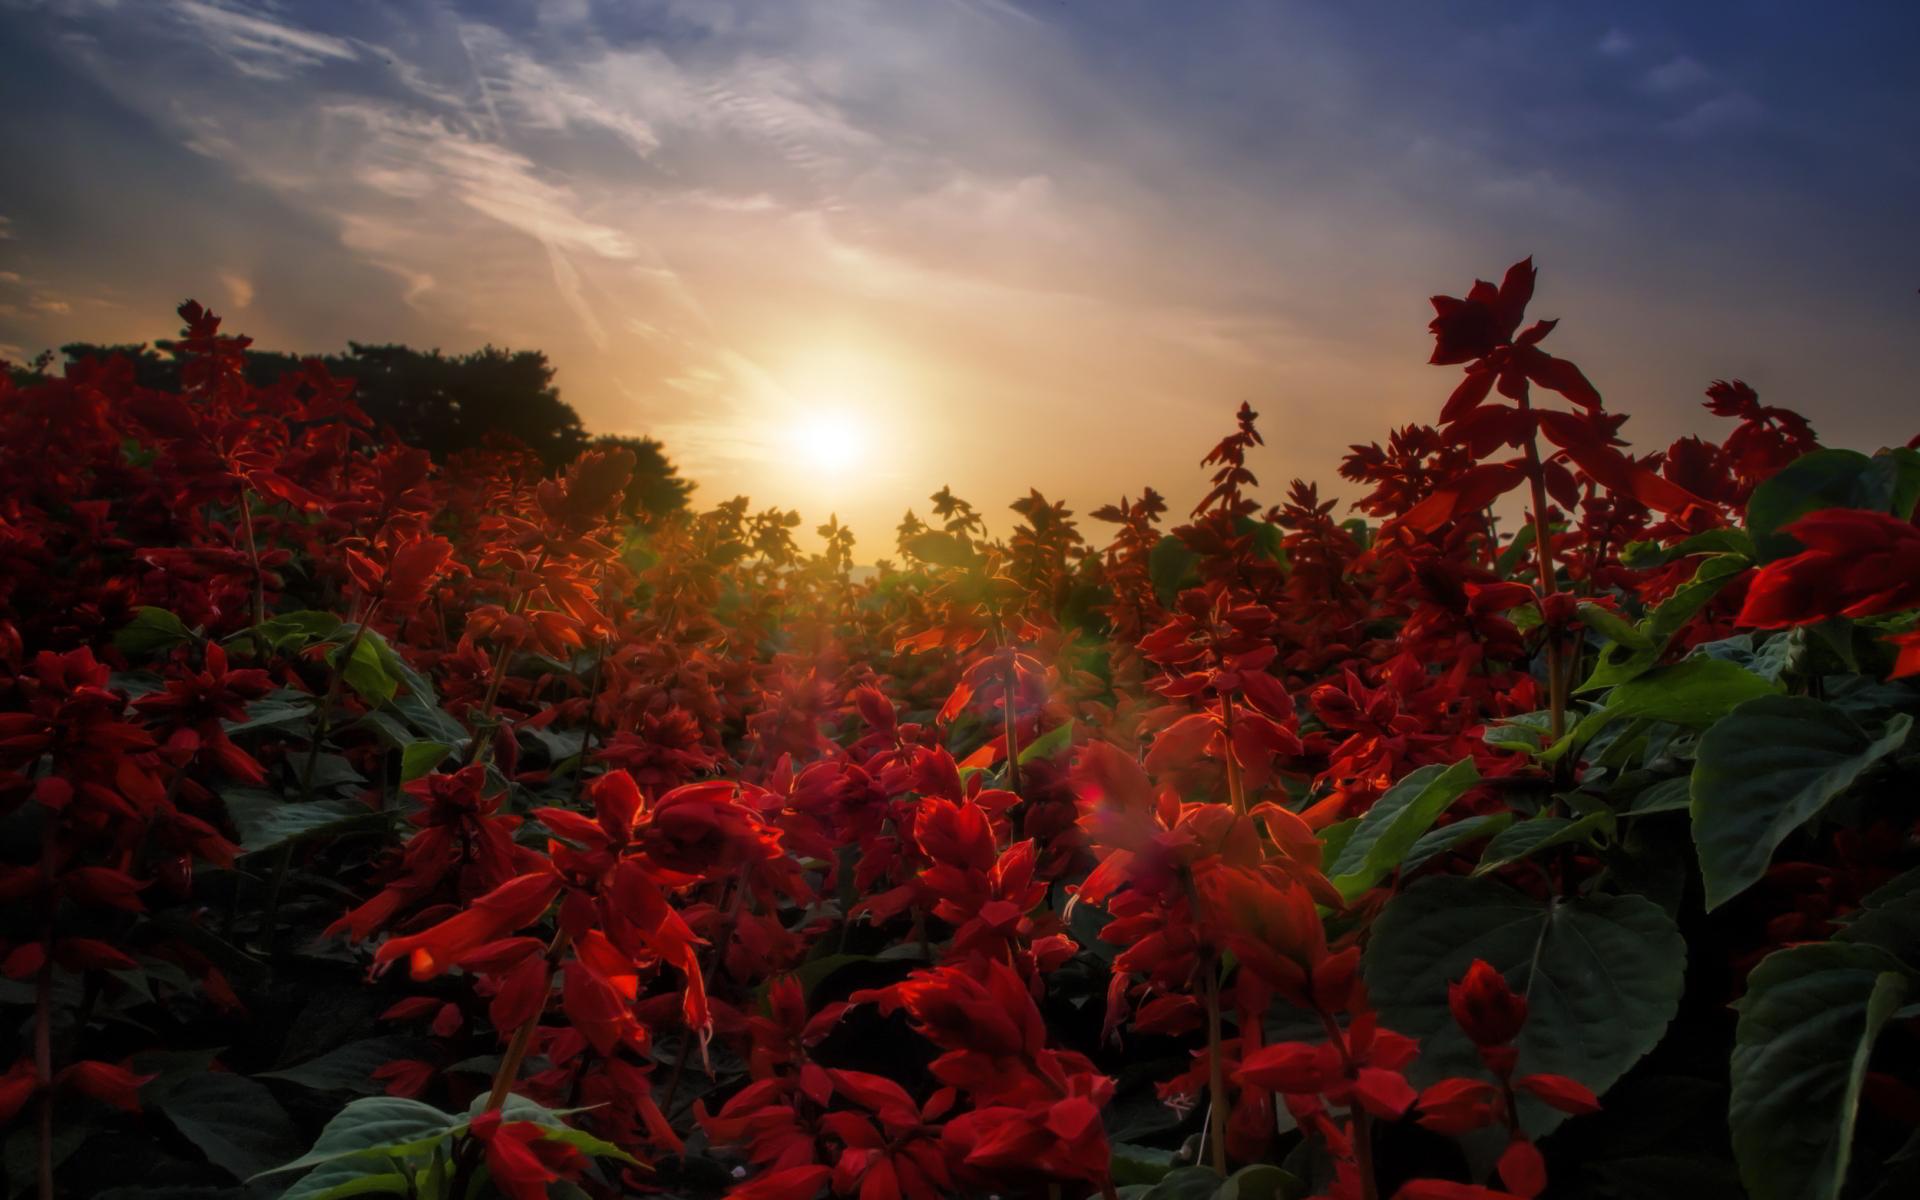 red salvia flowers